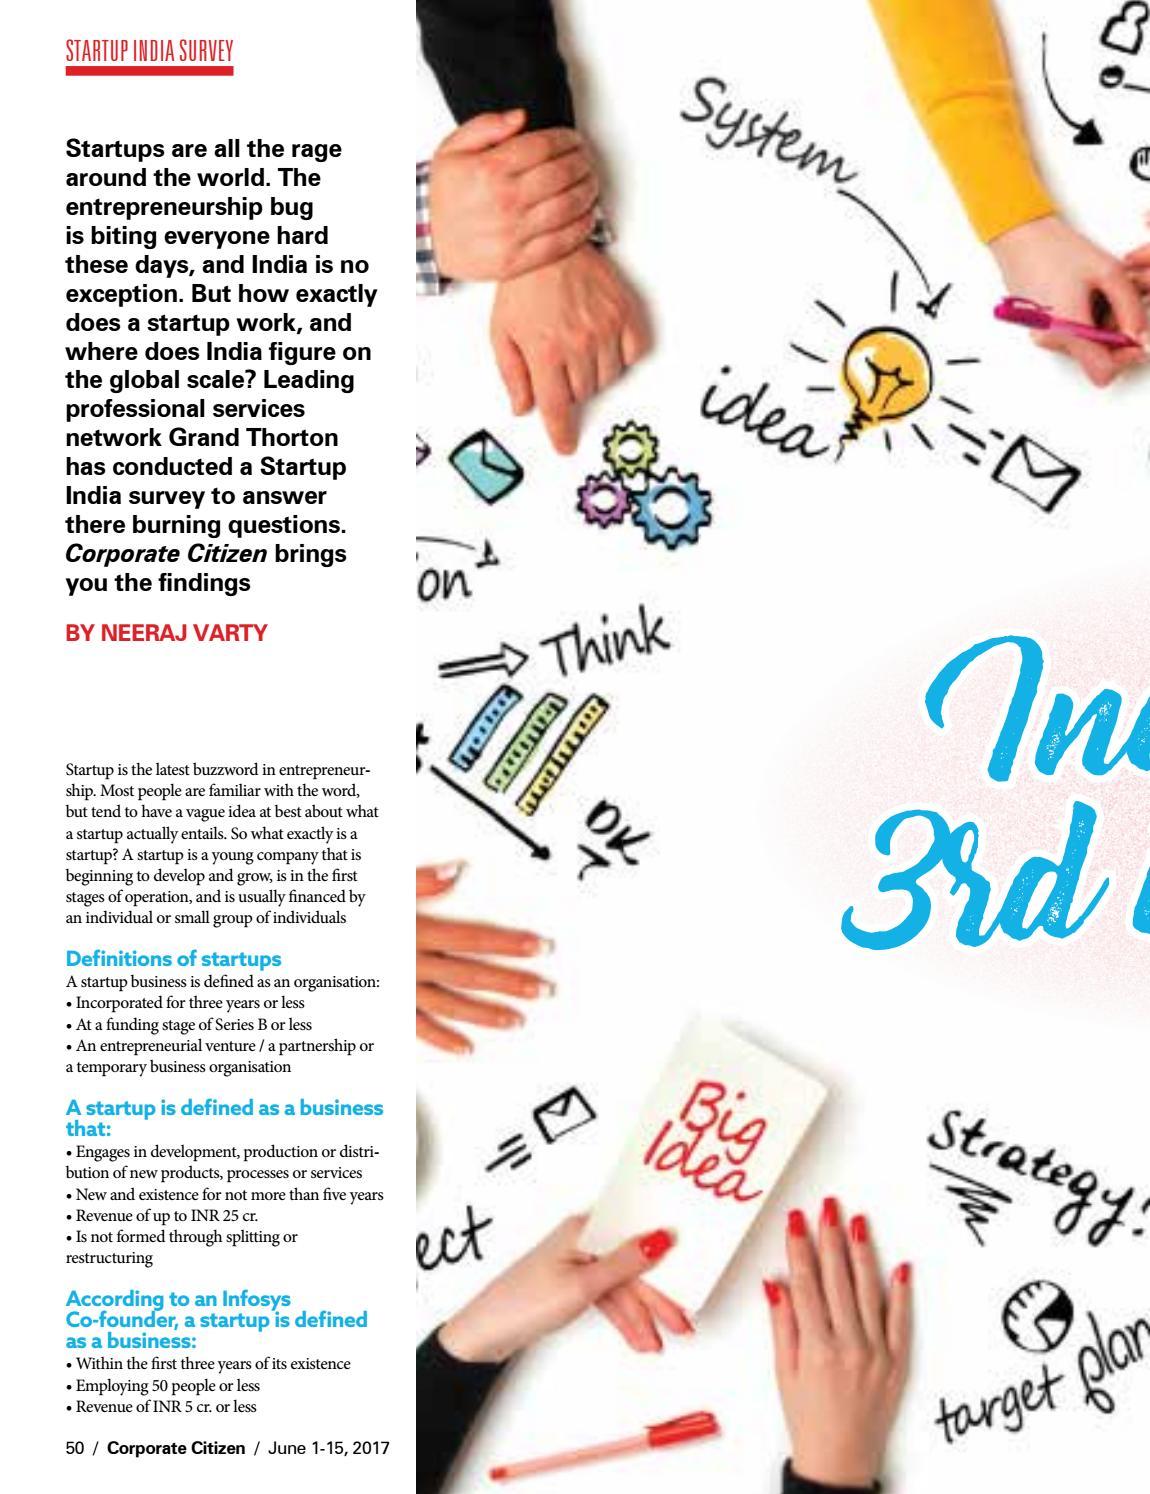 Volume3 issue 6 corporate citizen by Corporate Citizen - issuu